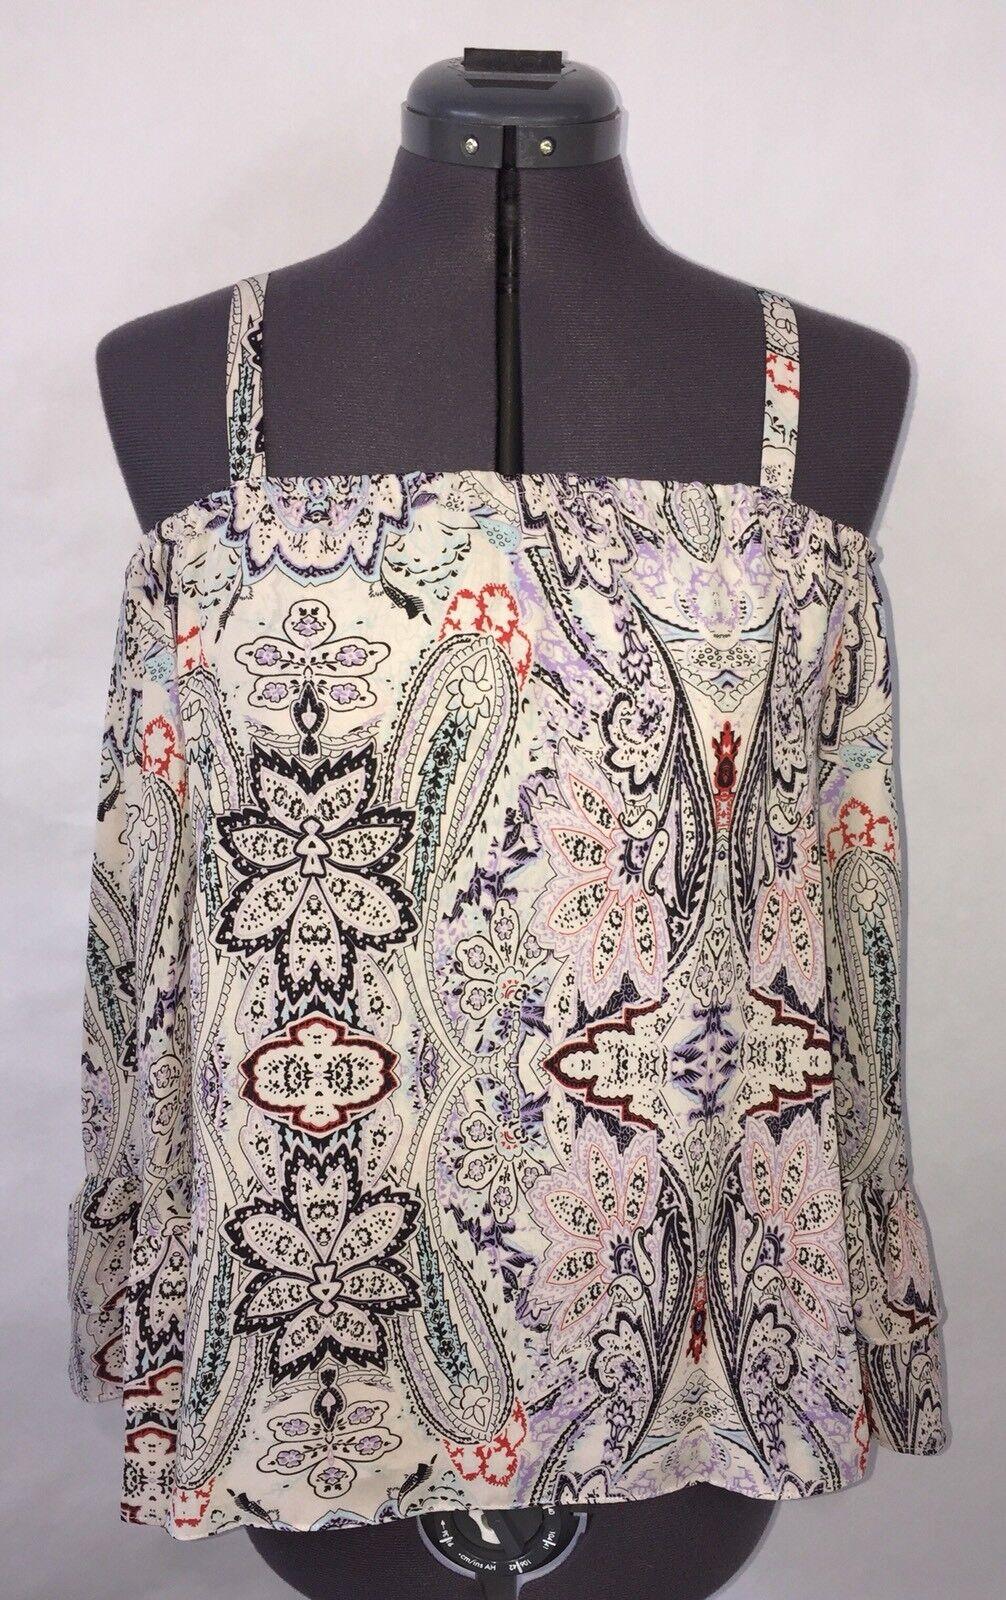 NWT PARKER damen's Henna Print Ruffle Cold Shoulder Top XS OverGrößed Bell Sleeve